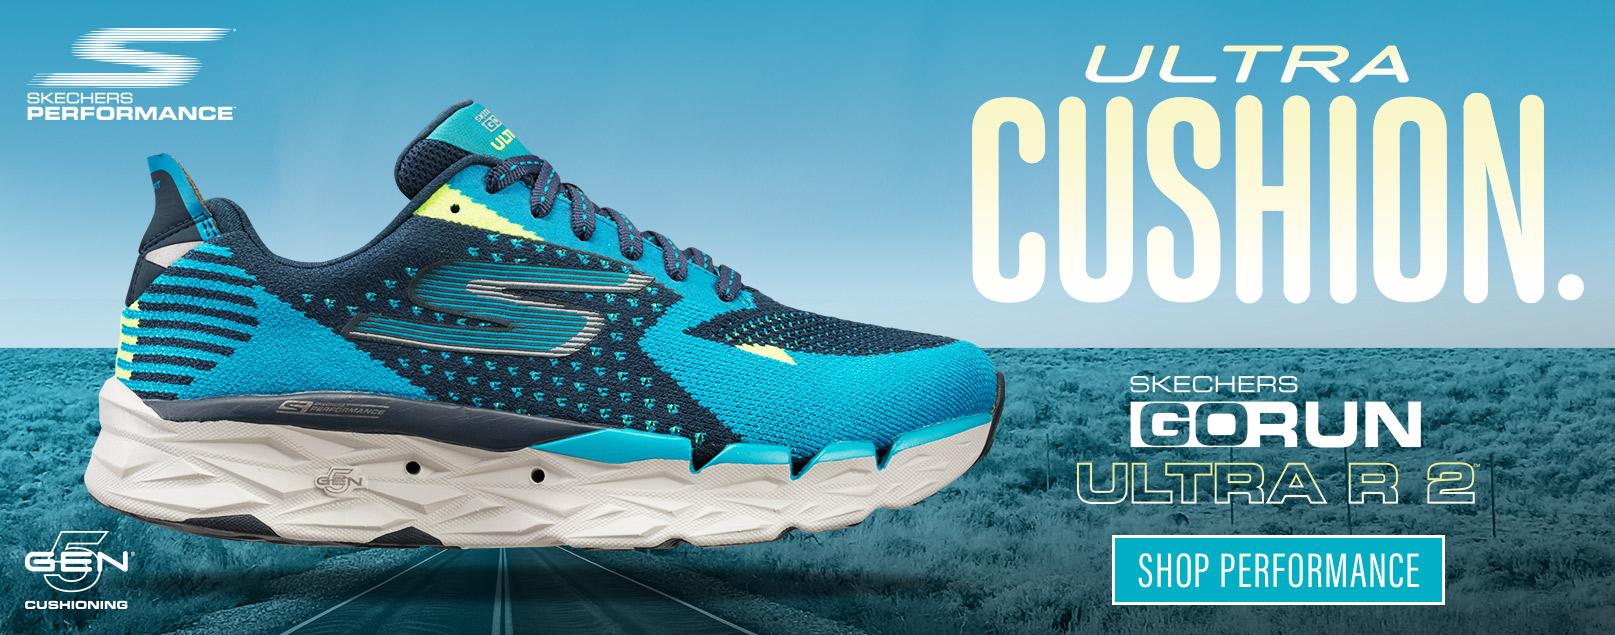 Skechers GOrun Ultra Road 2 shoes